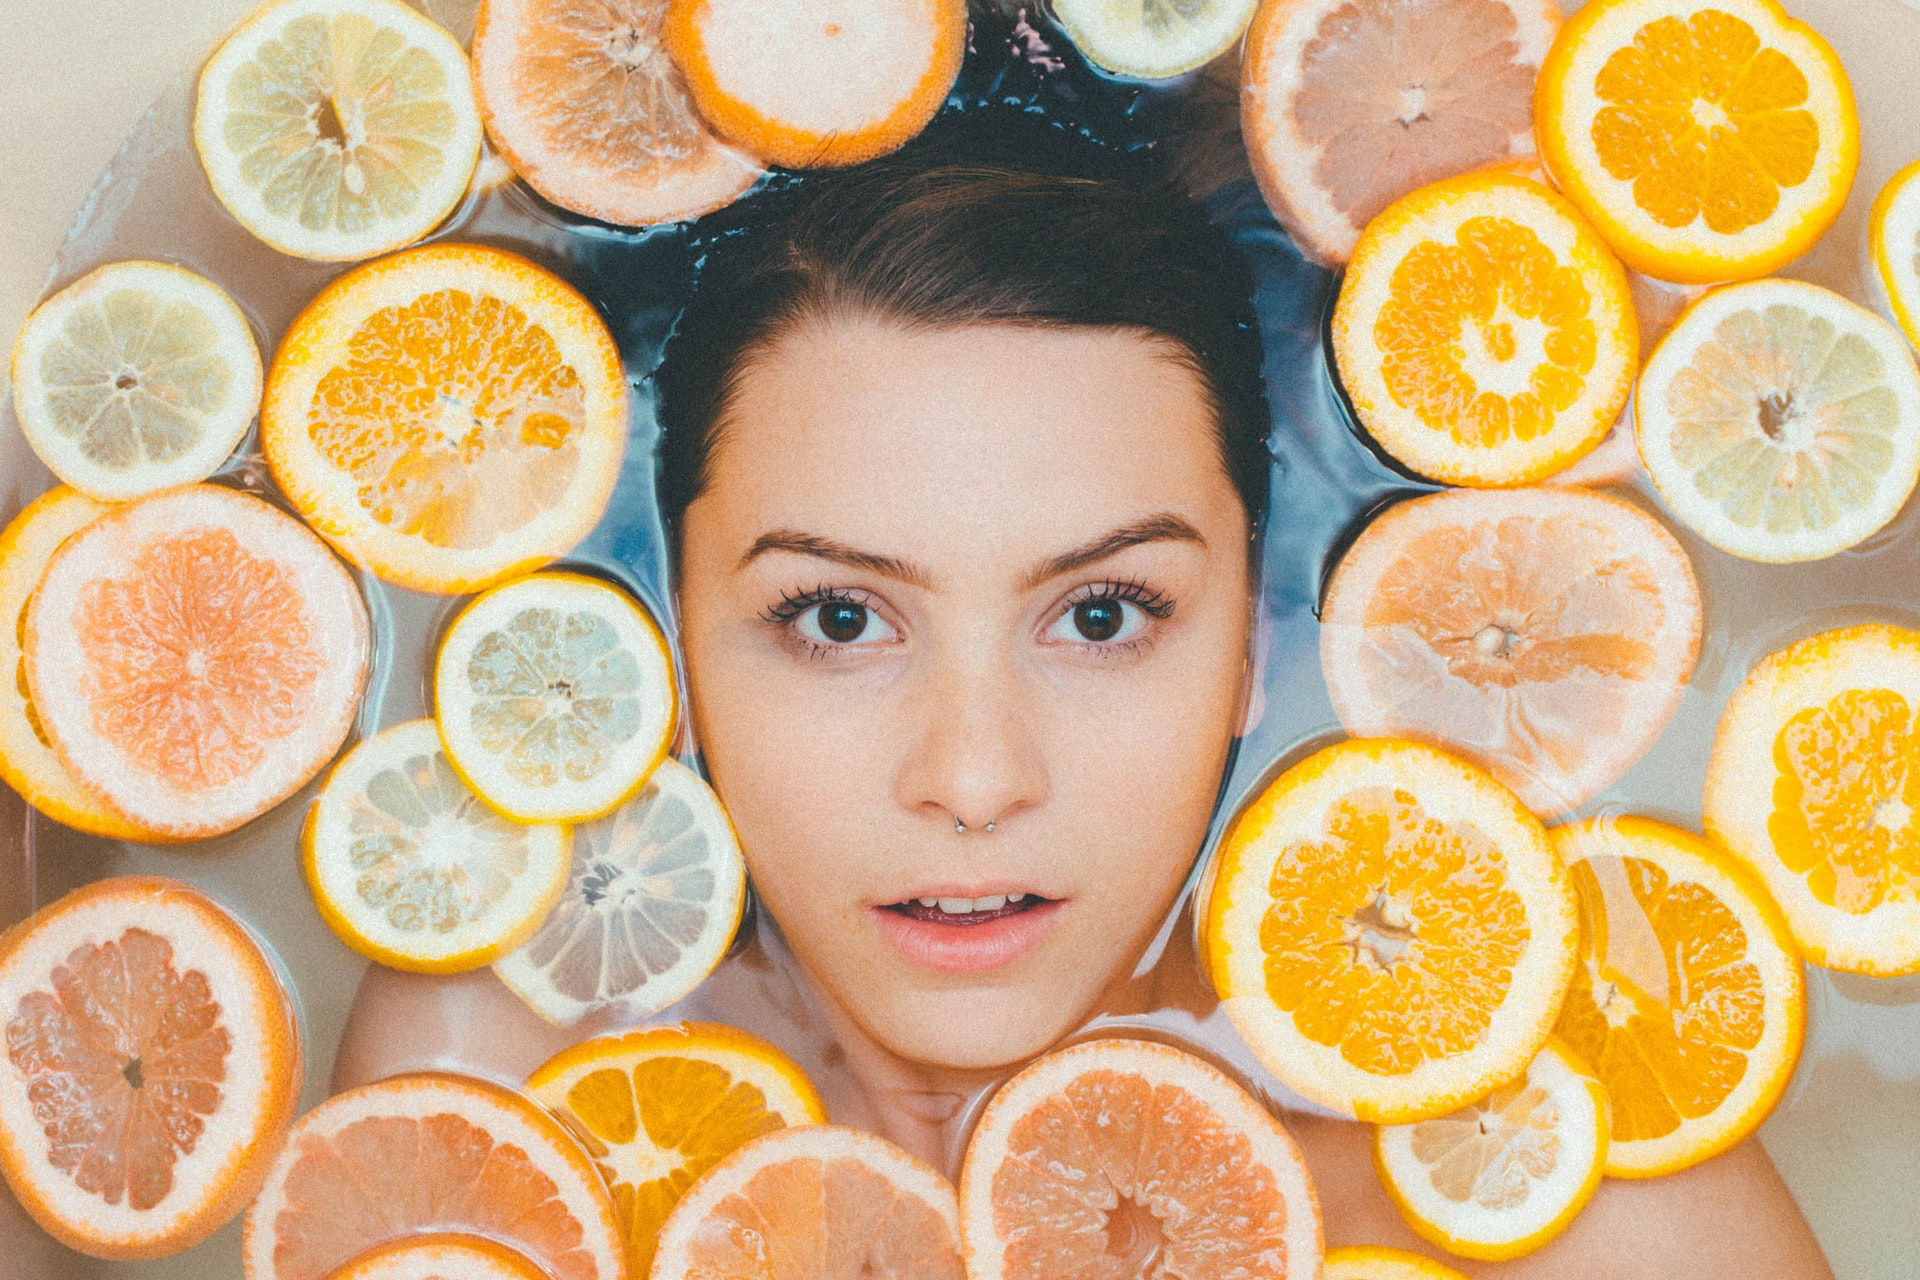 face floating in oranges